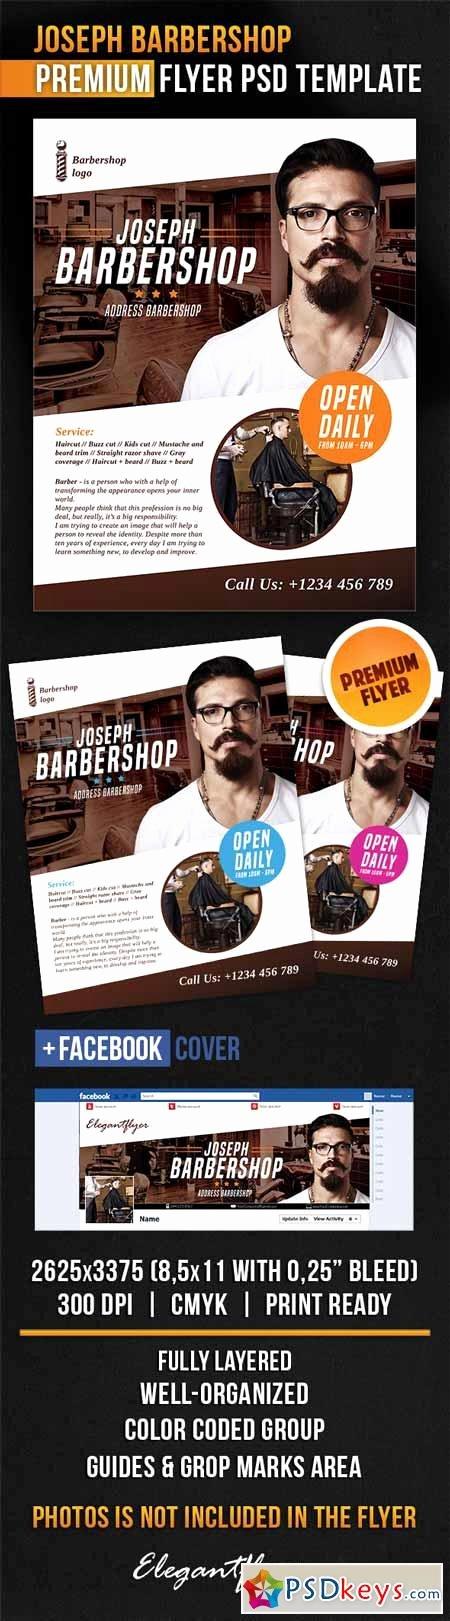 Facebook Ad Template Psd Unique Joseph Barbershop – Flyer Psd Template Cover